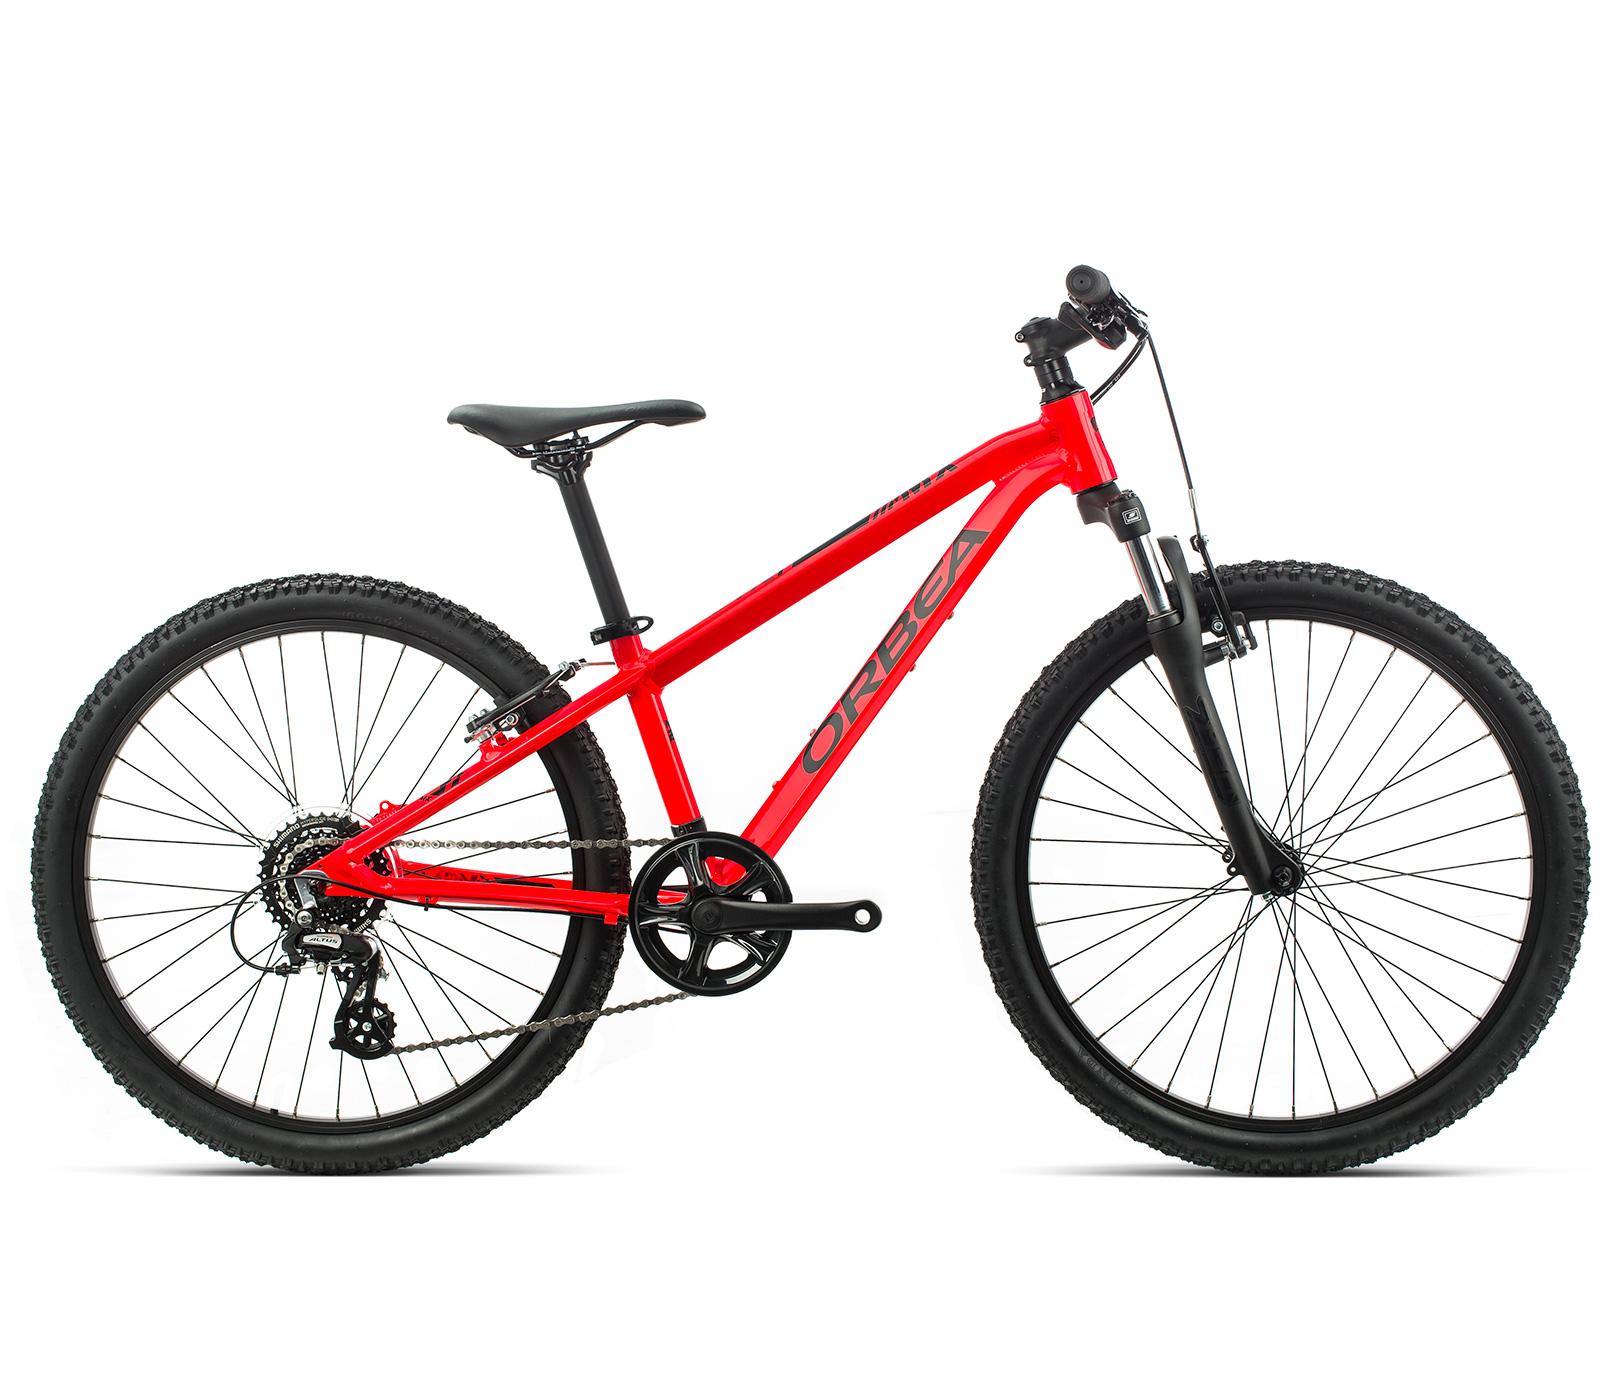 Orbea MX 24 XC kids mountain bike 2020 Red/Black